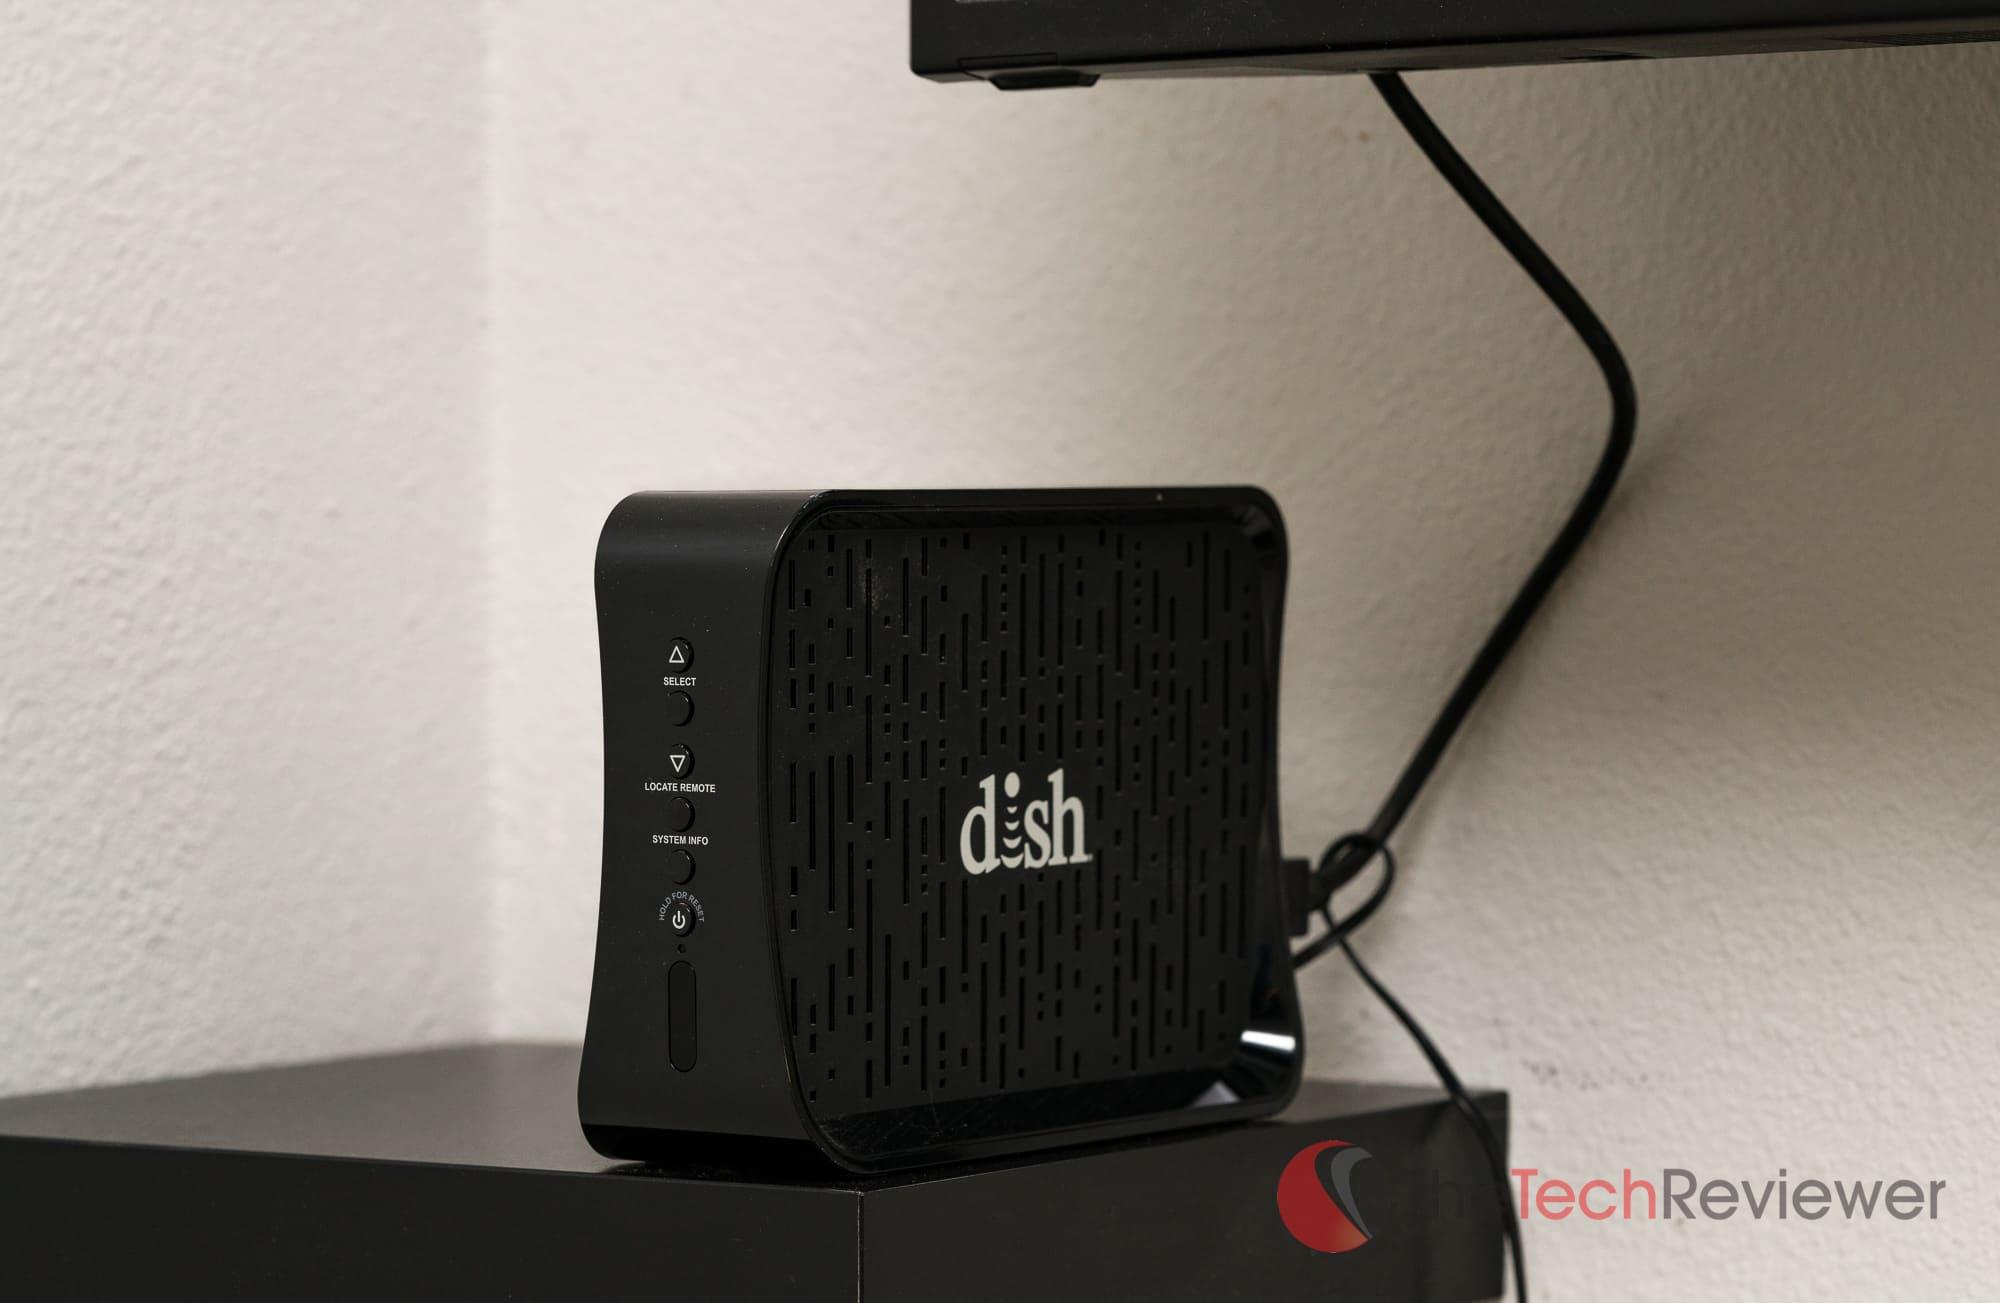 DISH Wireless Joey